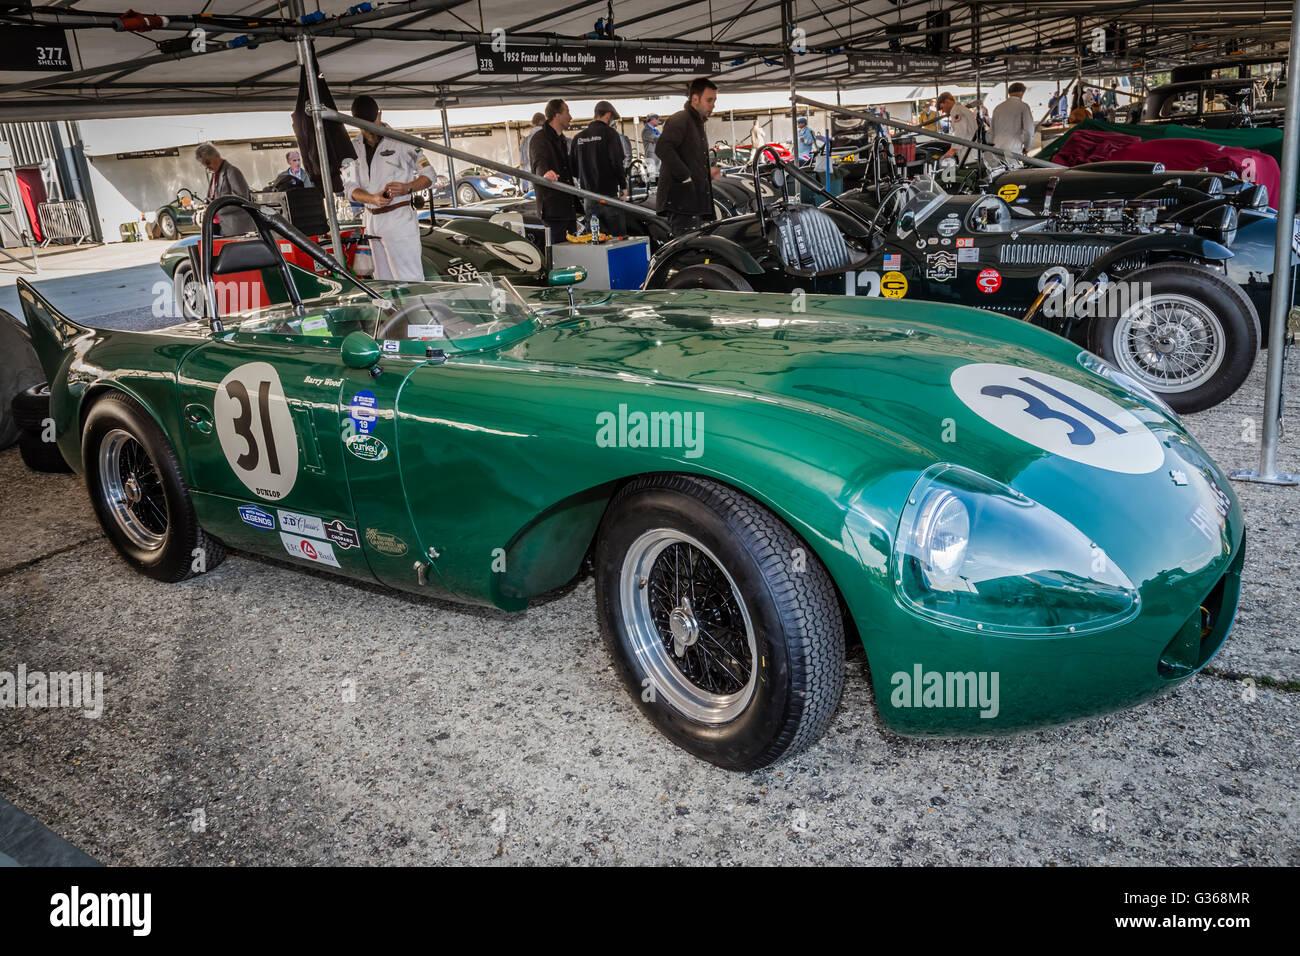 Barry und Tony Wood 1952 RGS-Jaguar Atlanta im Fahrerlager bei 2015 Goodwood Revival, Sussex, UK. Stockbild